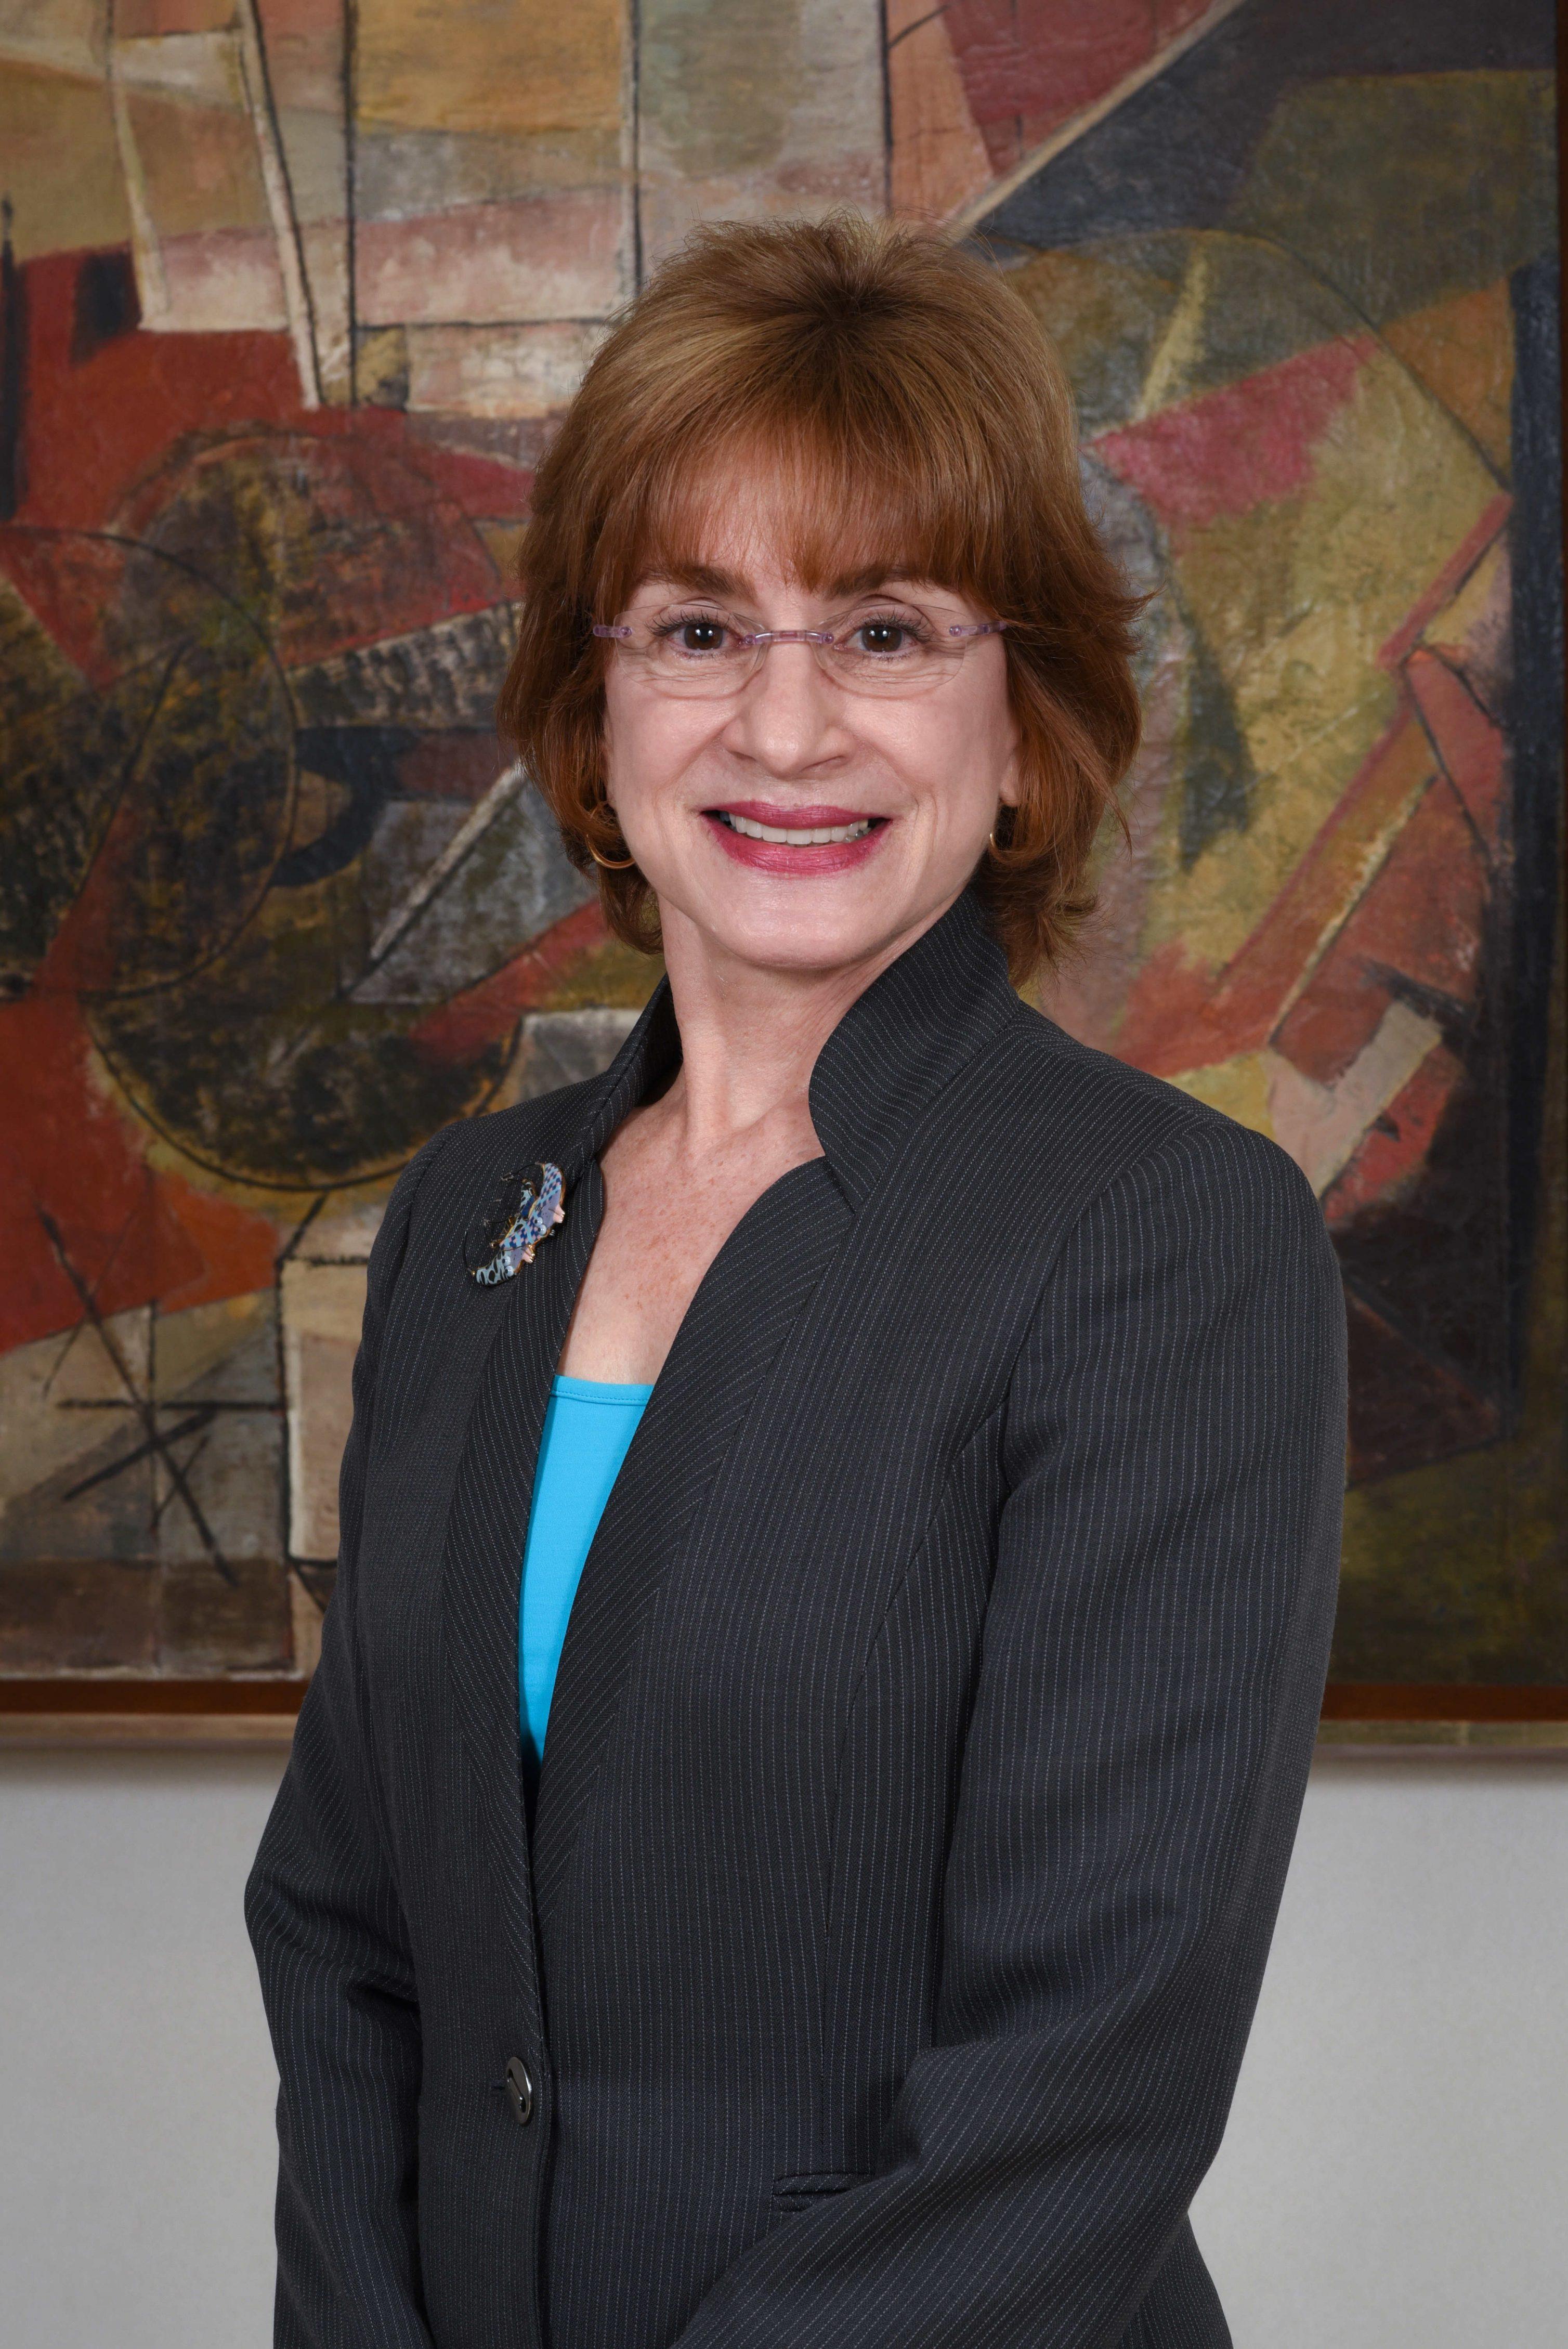 Dra. Celeste Freytes, Presidenta Interina de la UPR